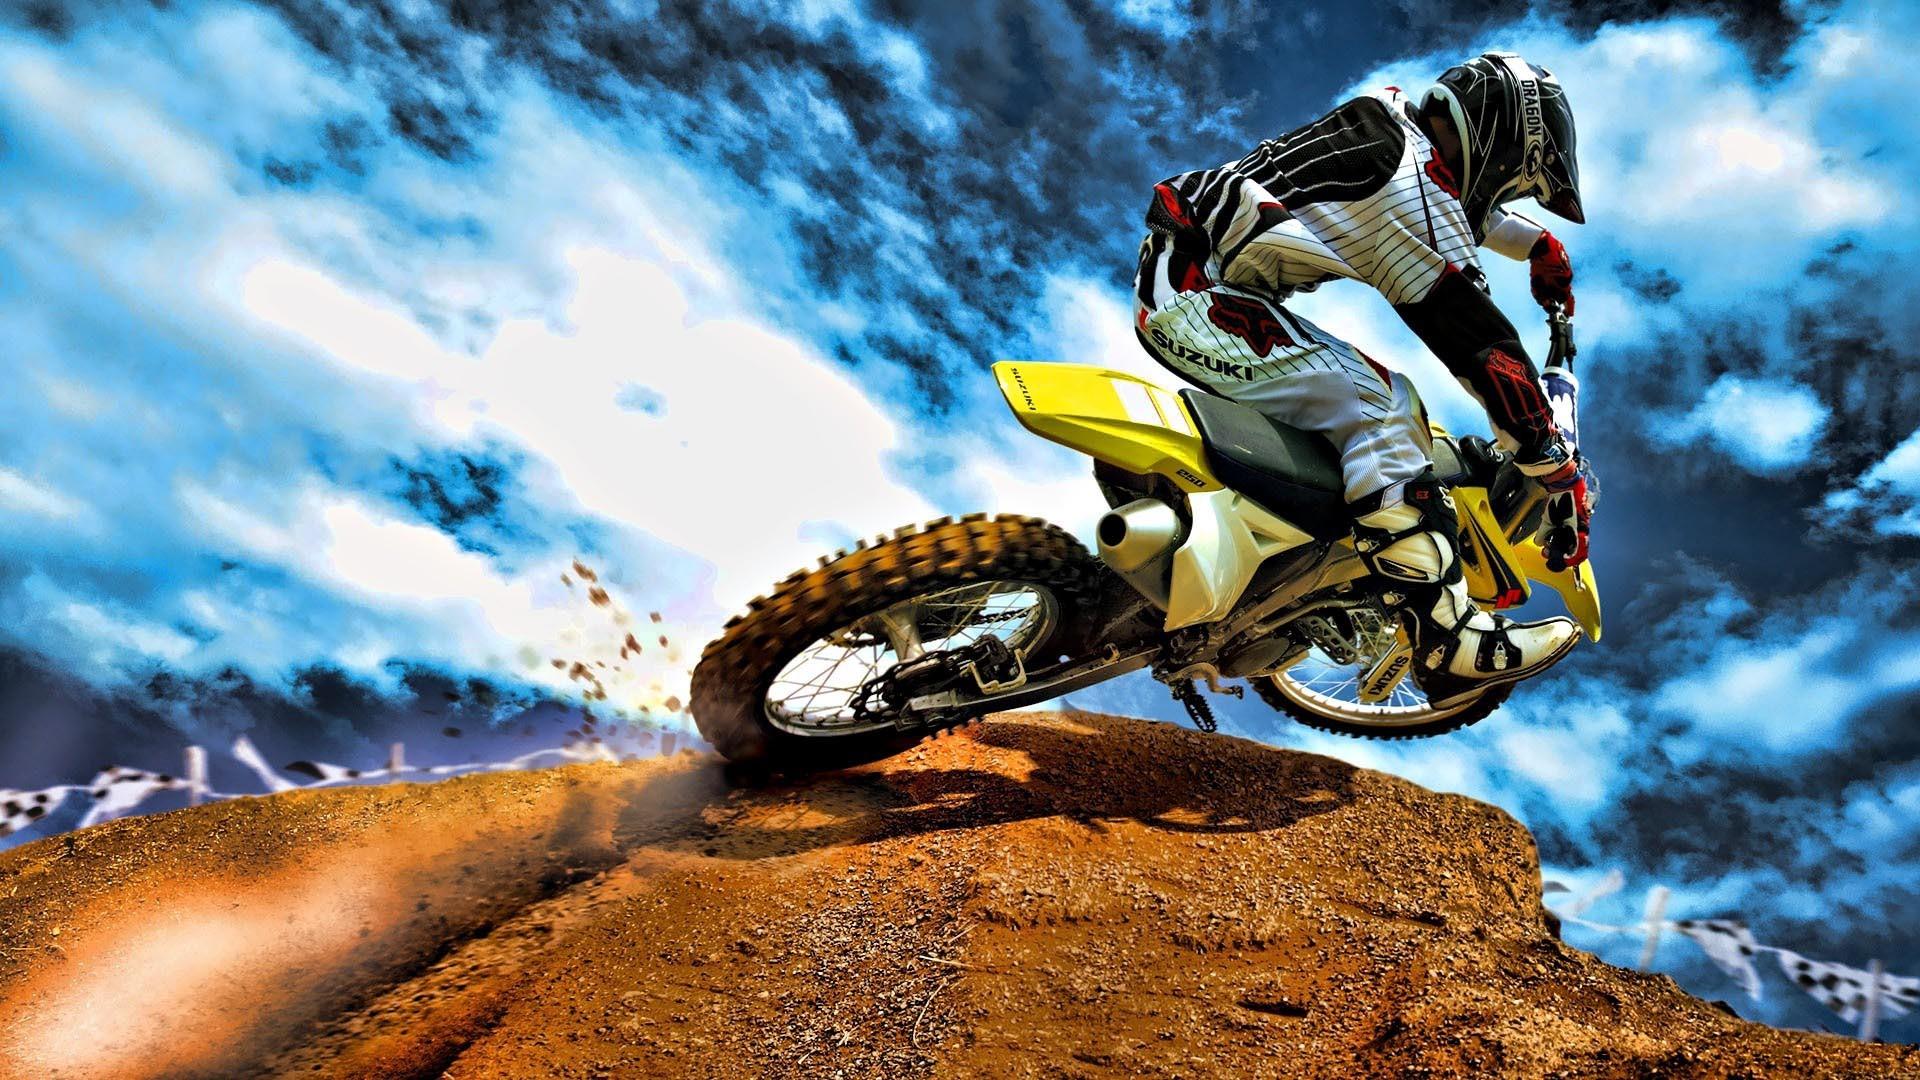 Full HD D Wallpapers Wallpaper 1920×1080 Full HD Wallpapers 1920×1080 Free  Download · Motocross …